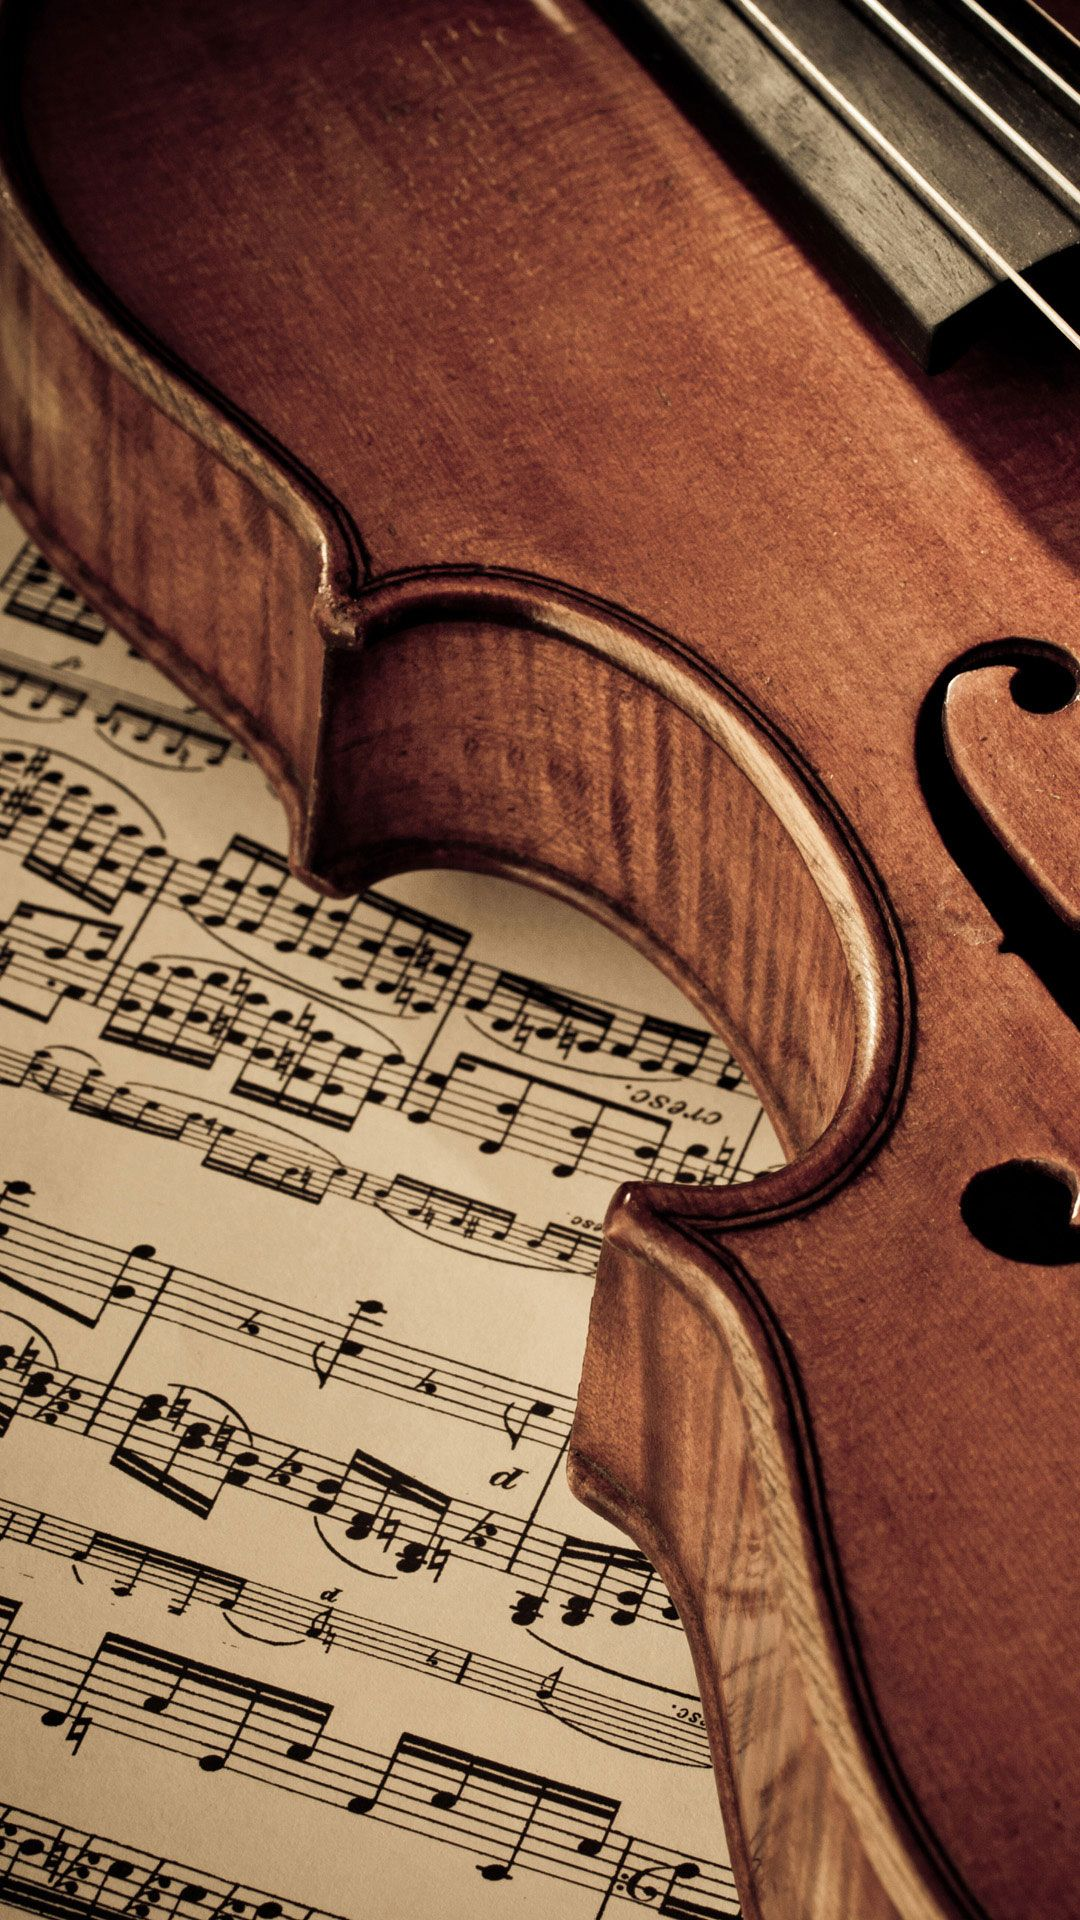 Violin Wallpaper Music Musica Violino Fotografia De Violino Imagens De Violino